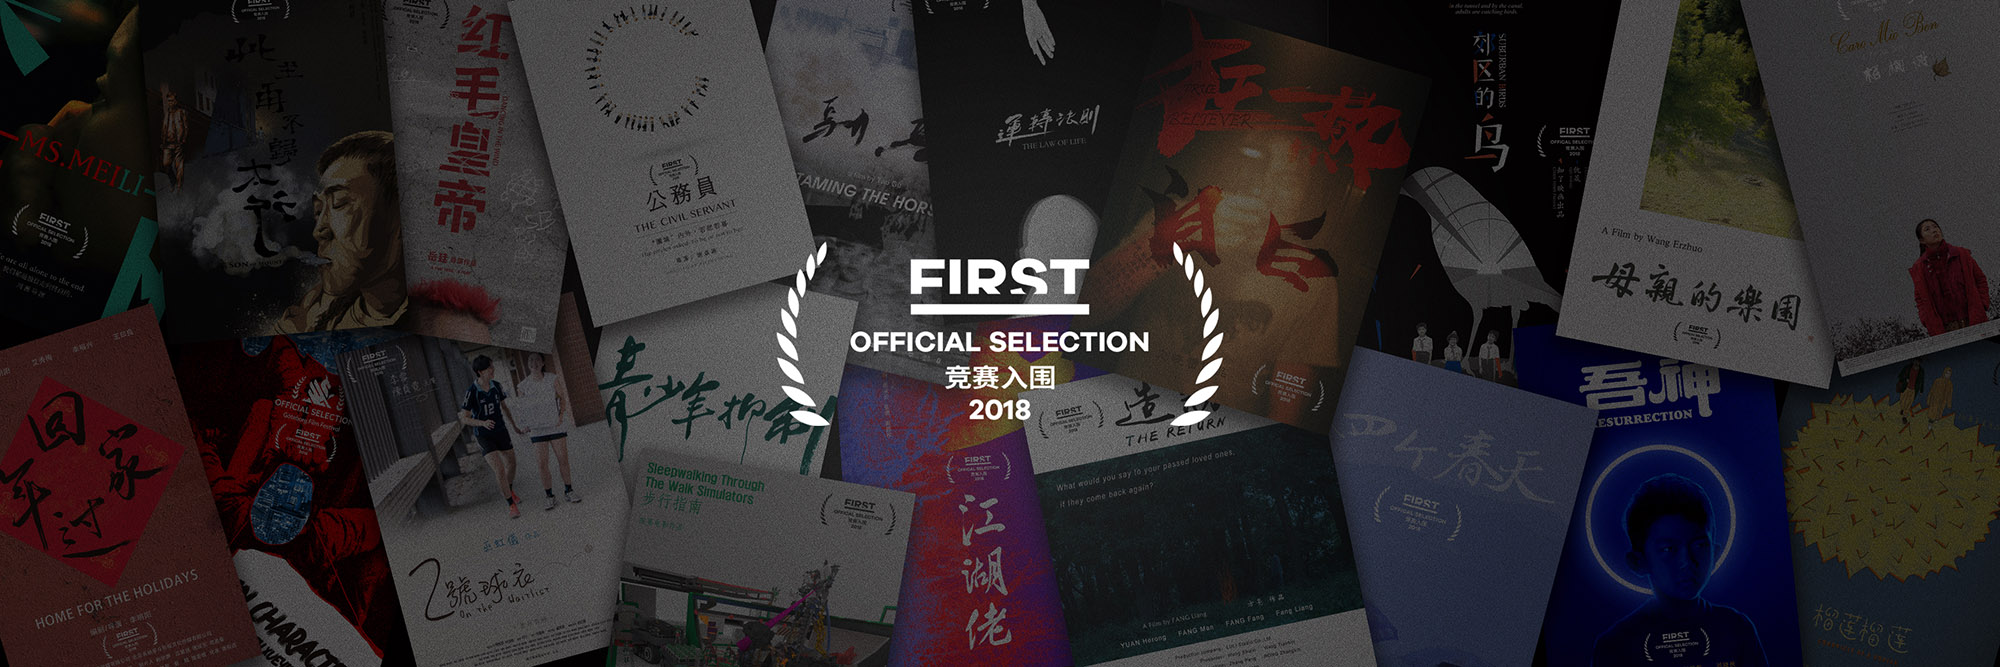 cn.org.firstfilm.domain.support.MultiLanguageValue@2ff6f0d2